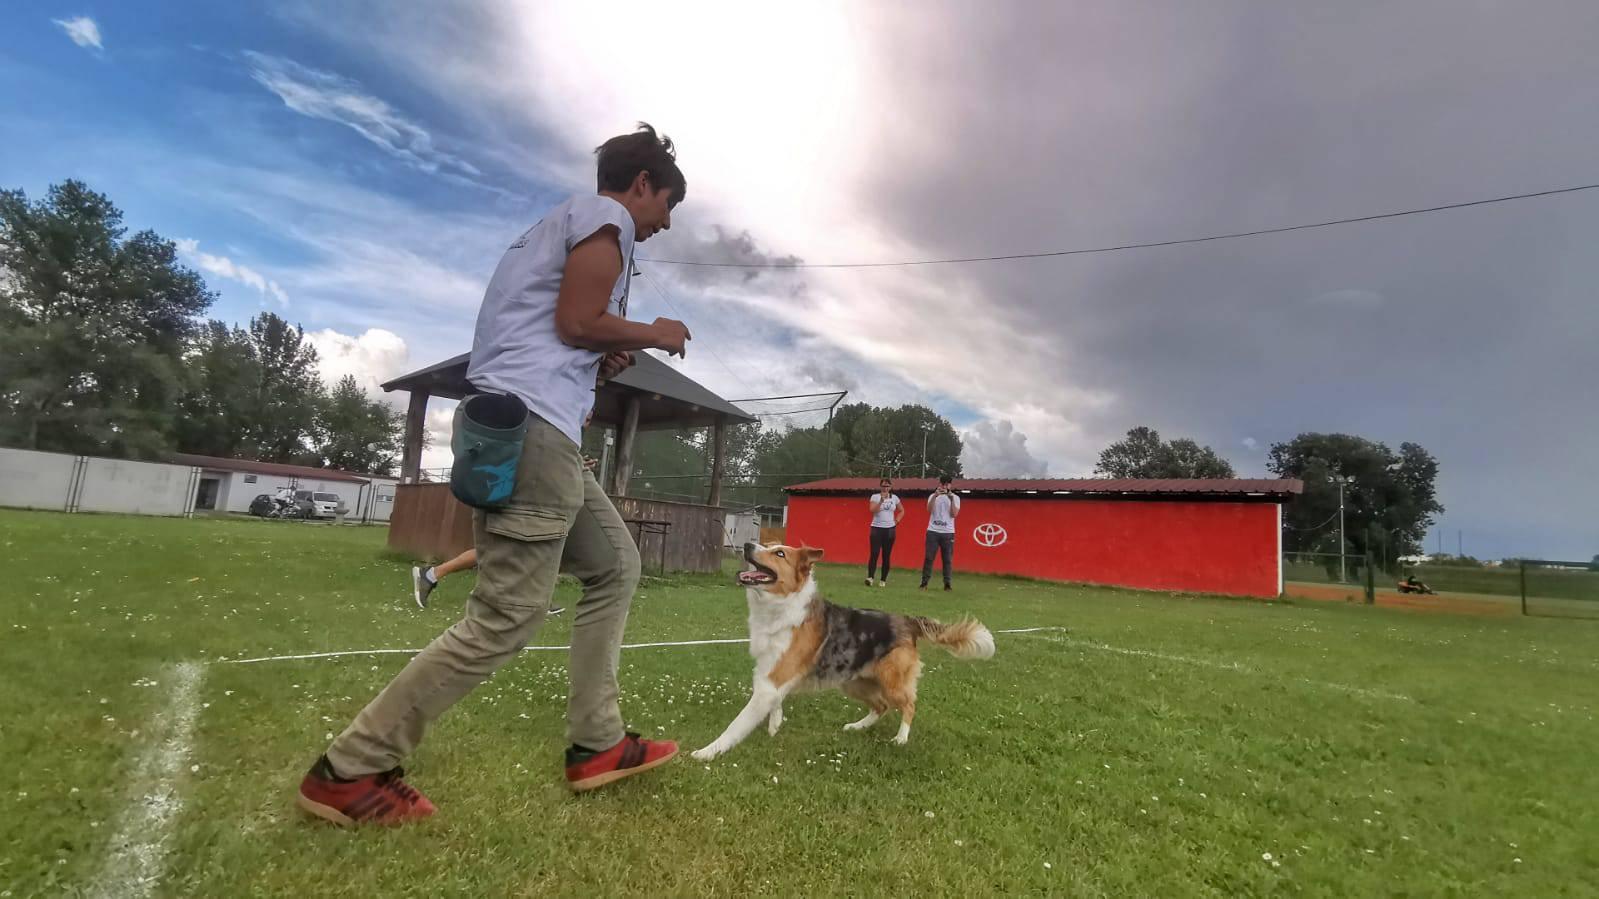 Kujica Kota nova je rekorderka - hoda unatraške na pet metara